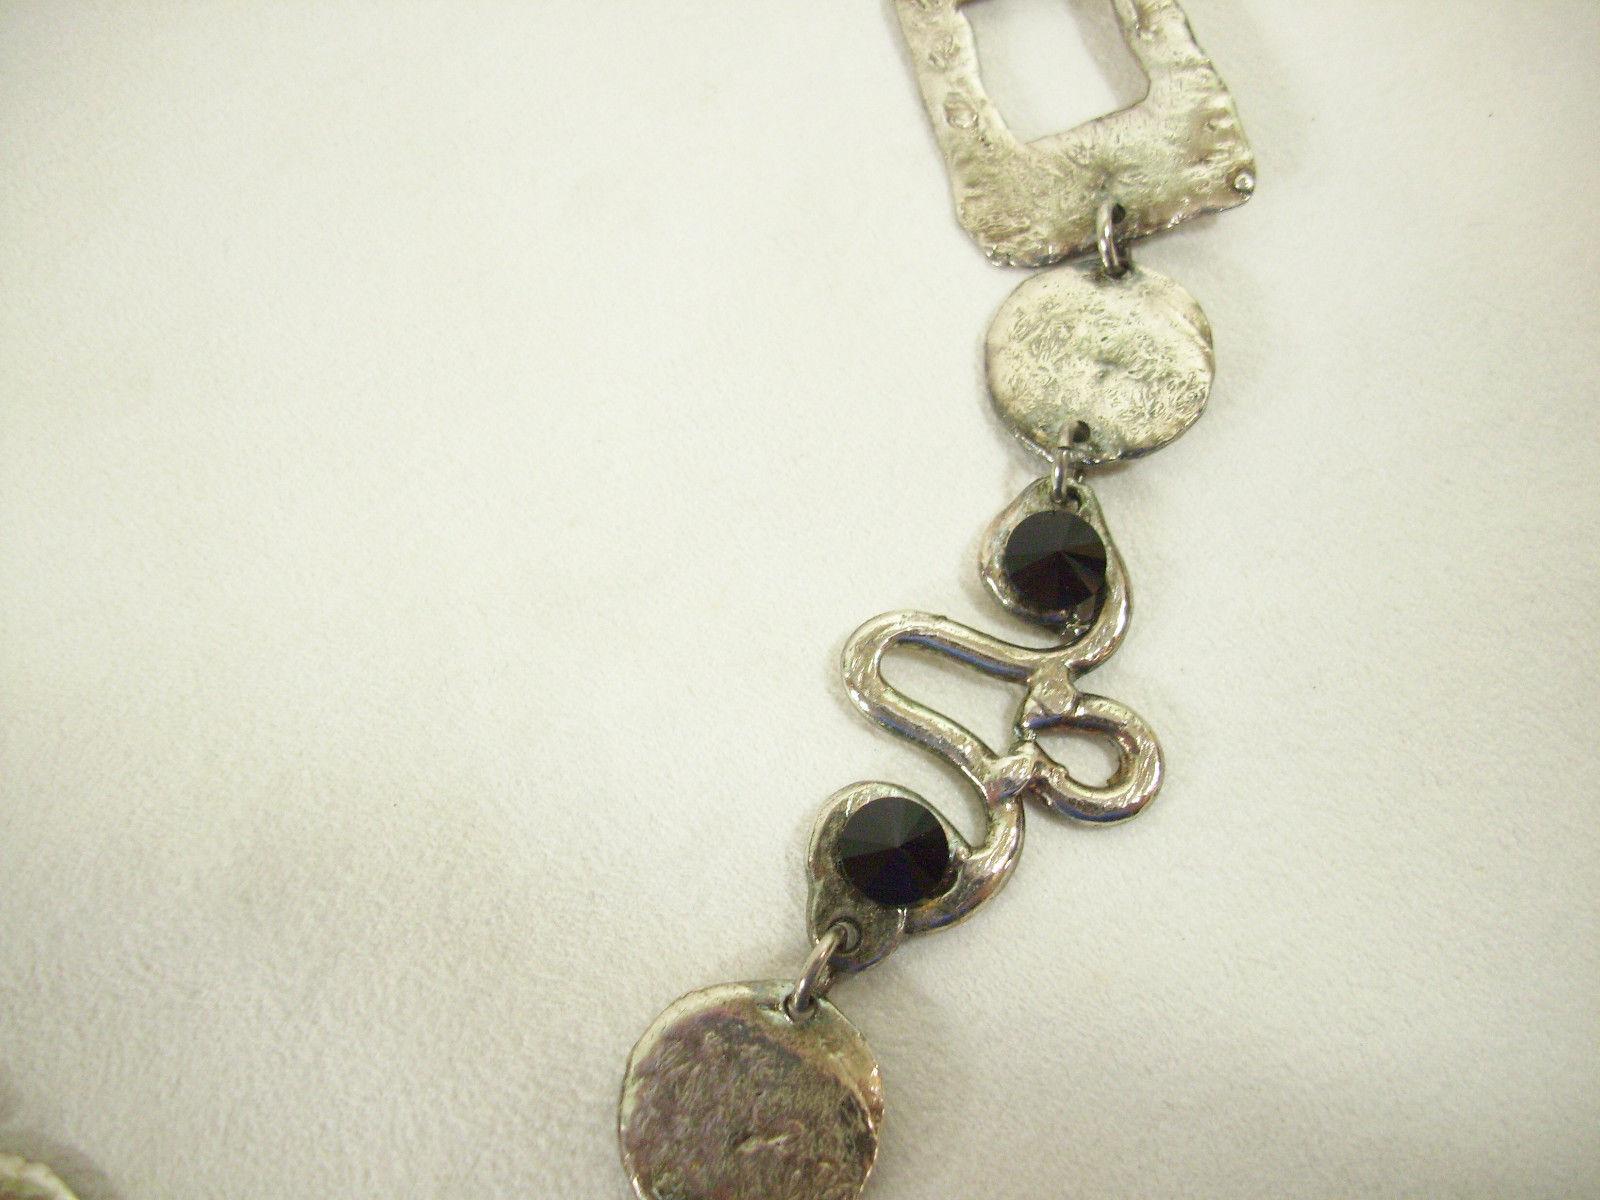 J JANSEN Brutalist Modernist Silver Gold Black Rivoli Necklace Handcraft Couture